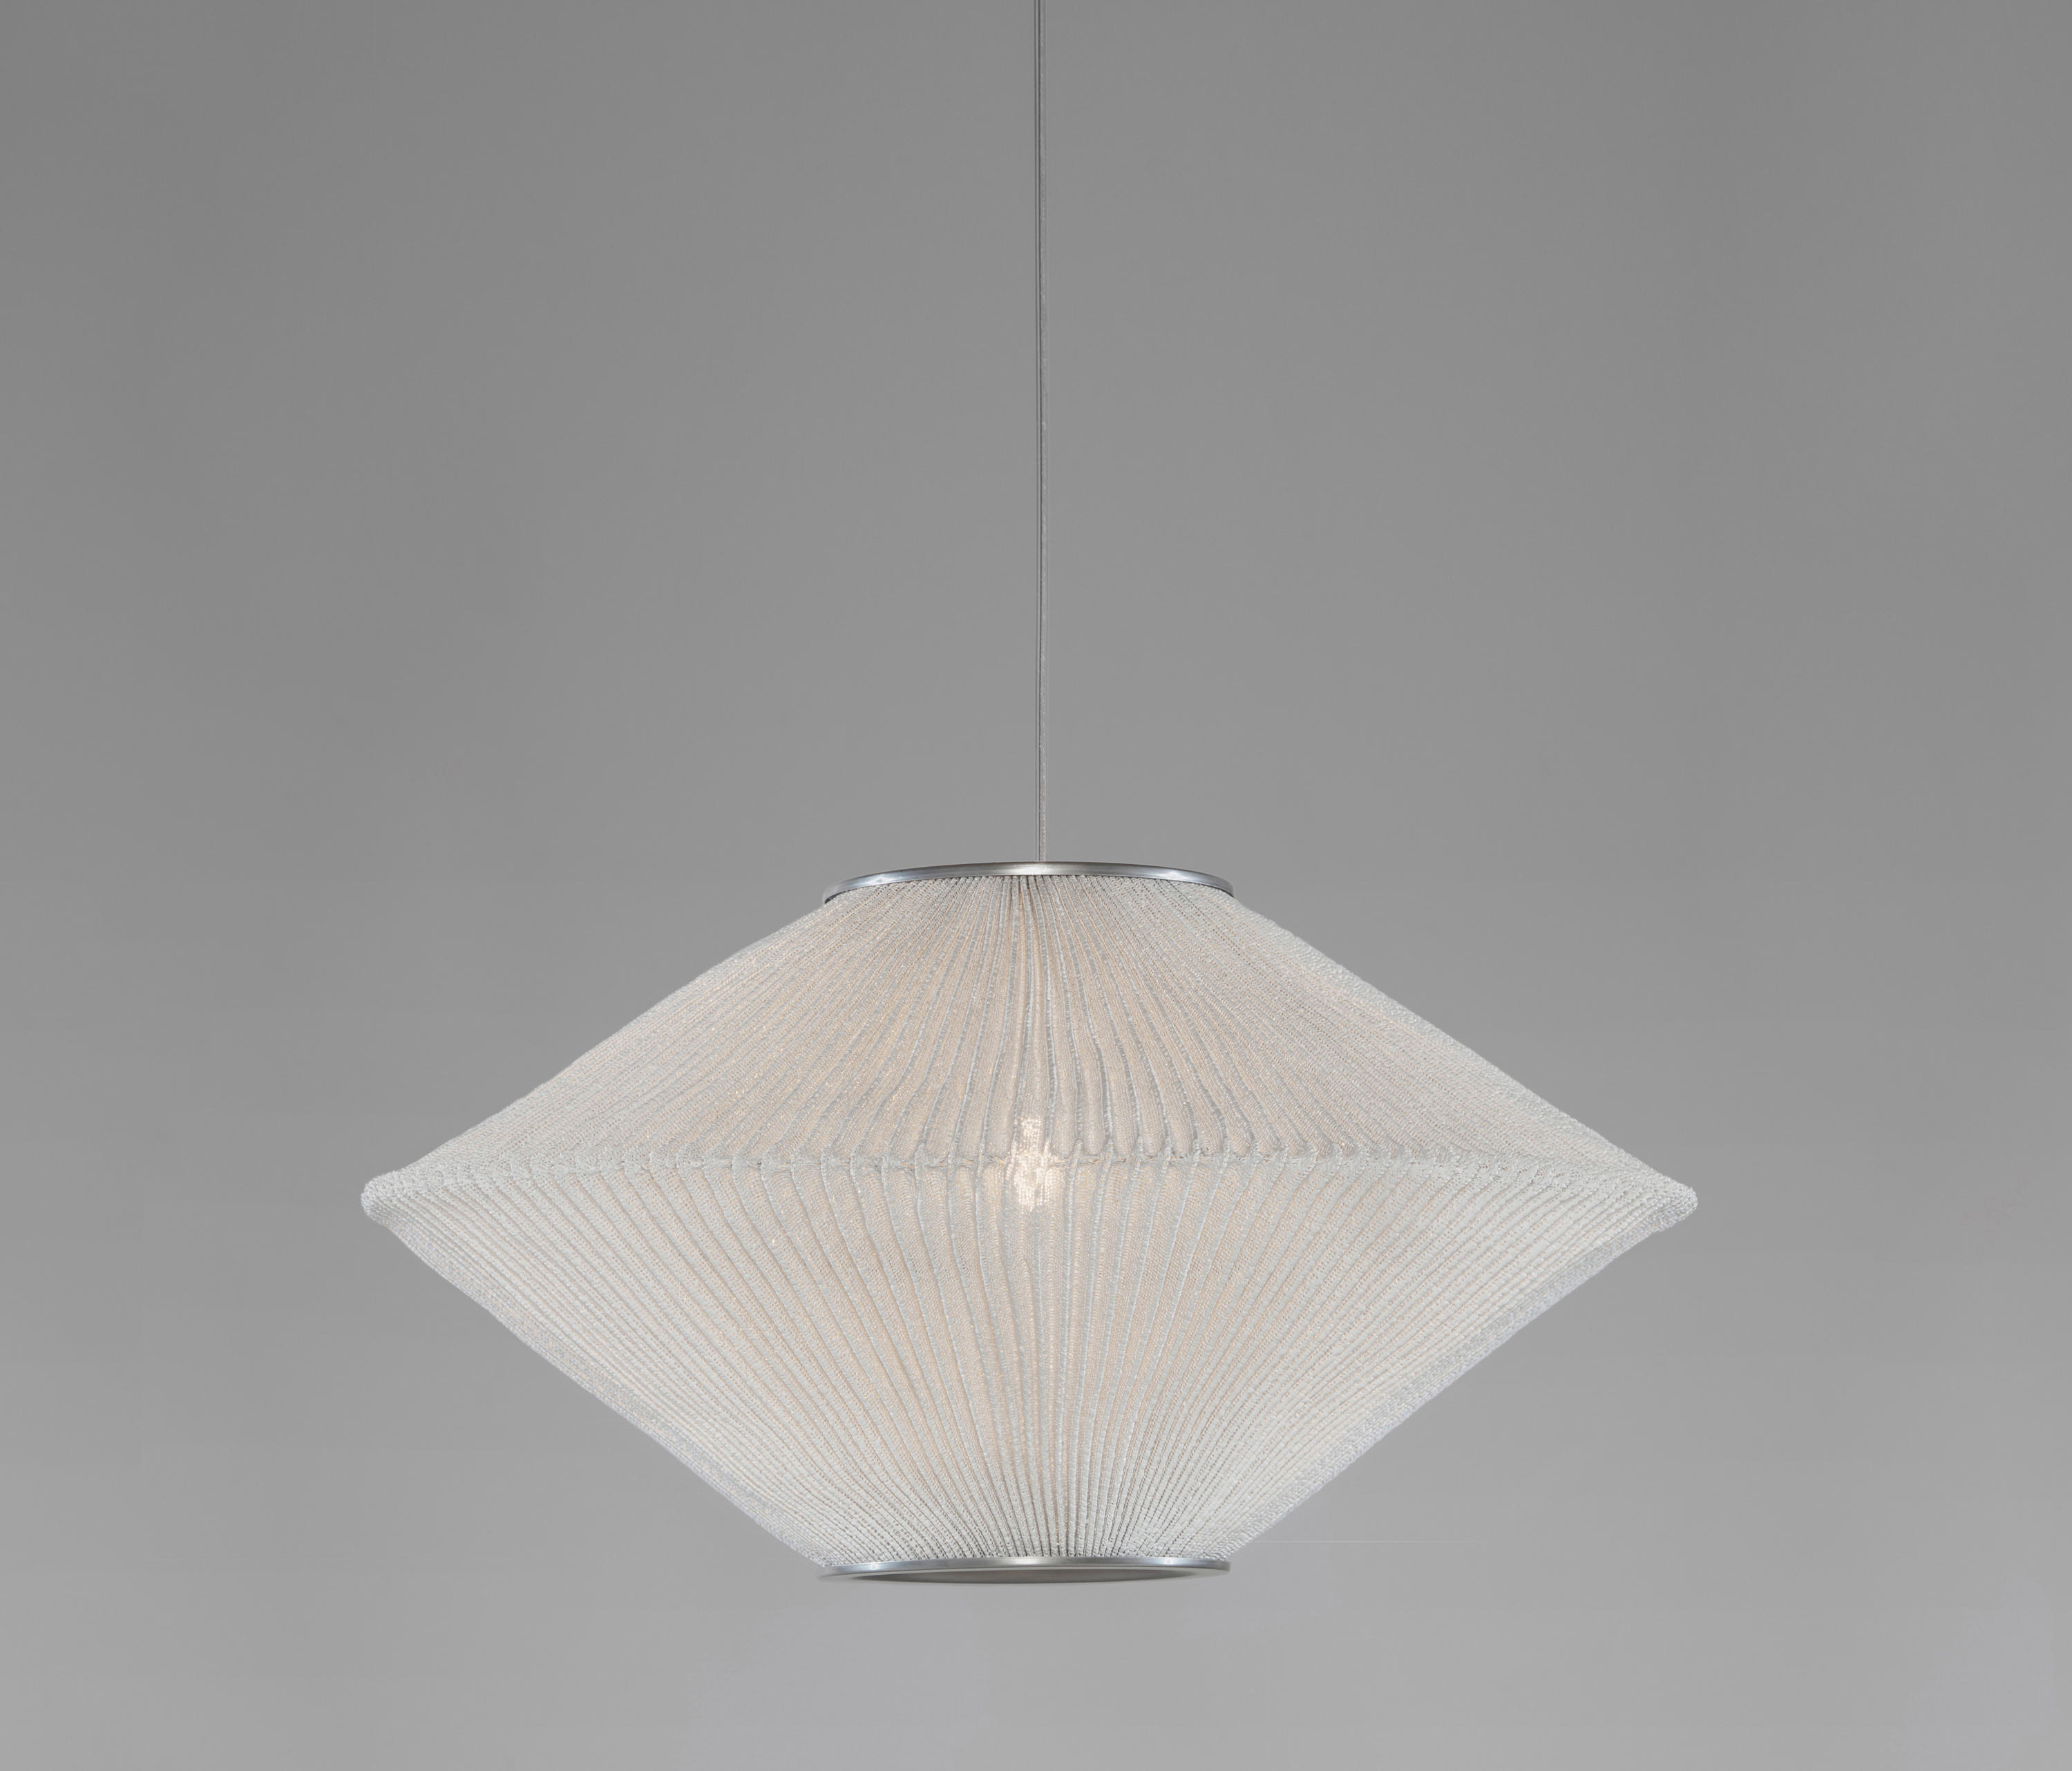 ura ur104 ld suspended lights from arturo alvarez architonic